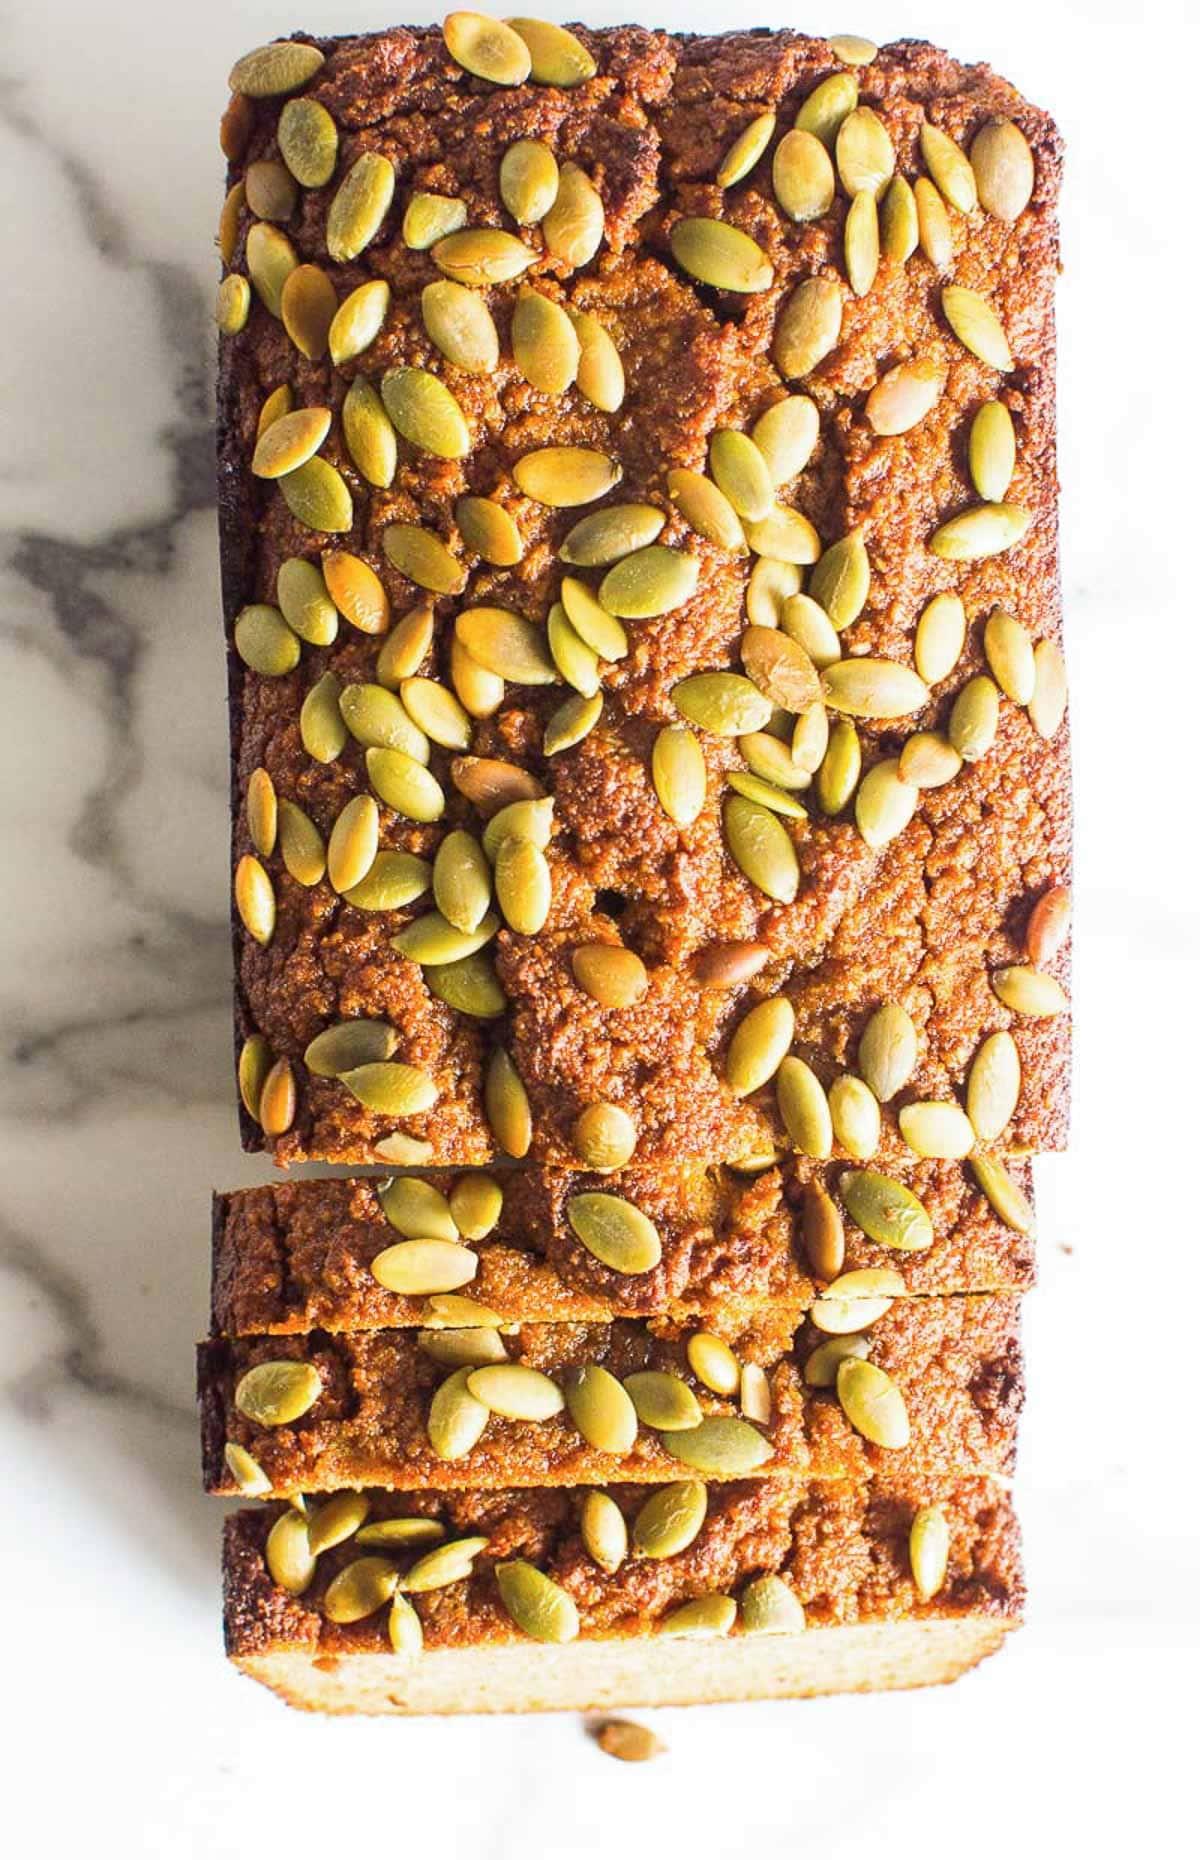 Almond Flour Pumpkin Bread with pumpkin seeds on top and sliced